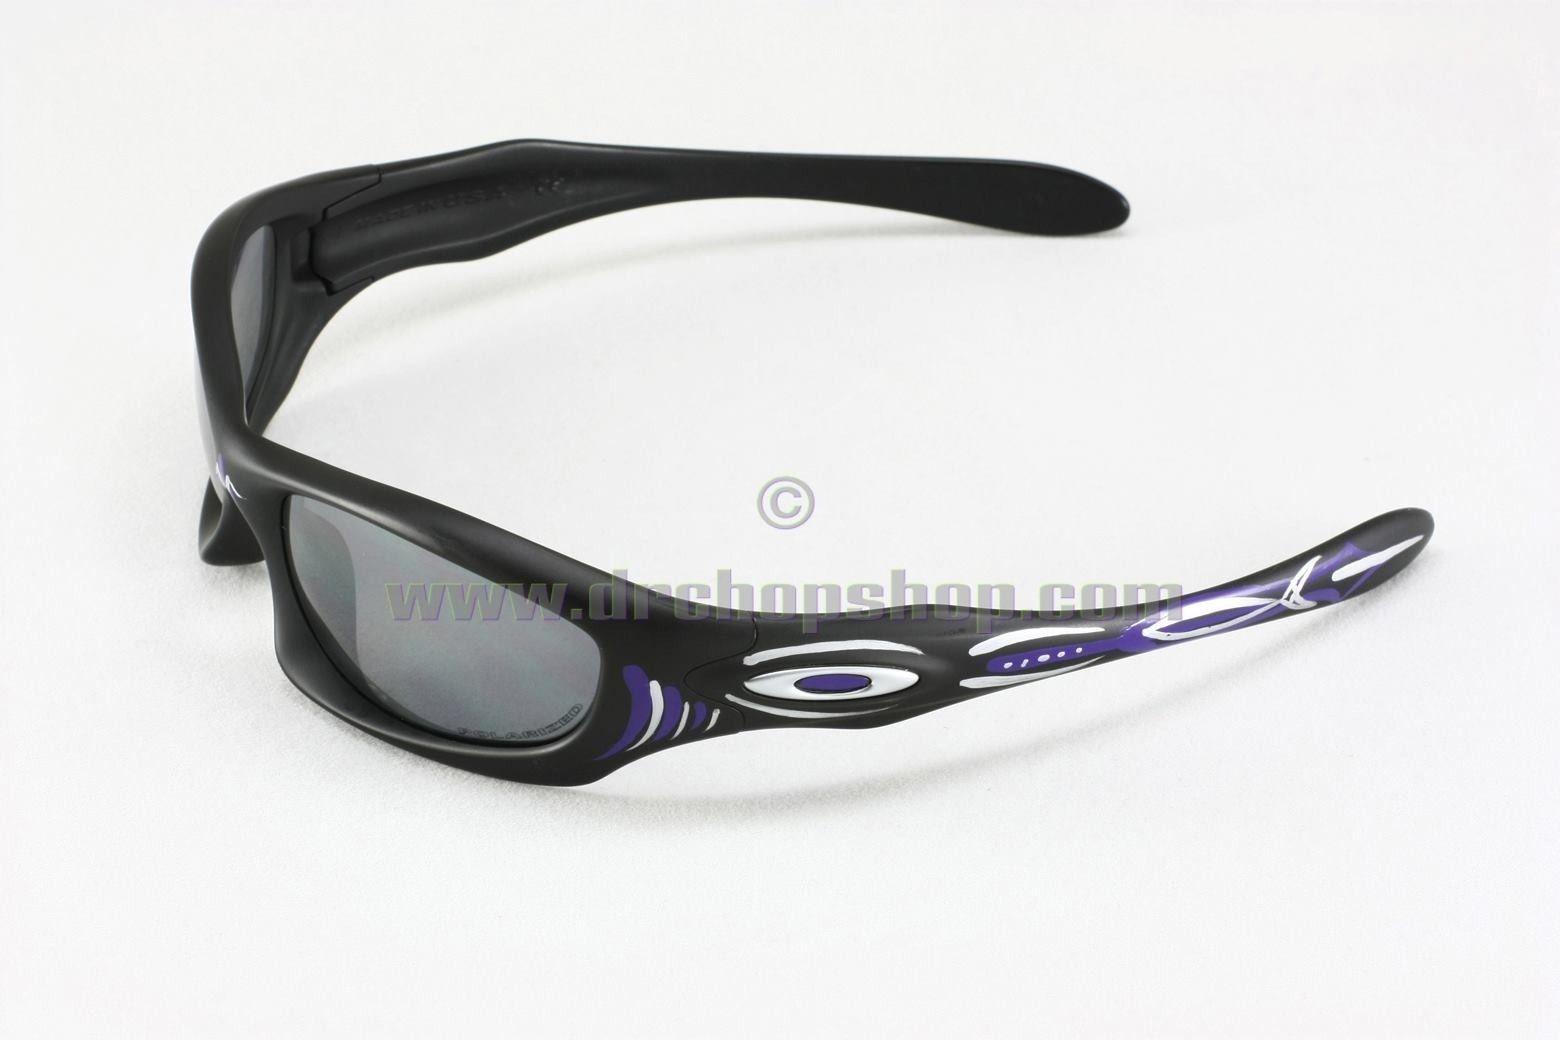 A Few Customs For Sale - 1073748_652144224797267_805337058_o.jpg